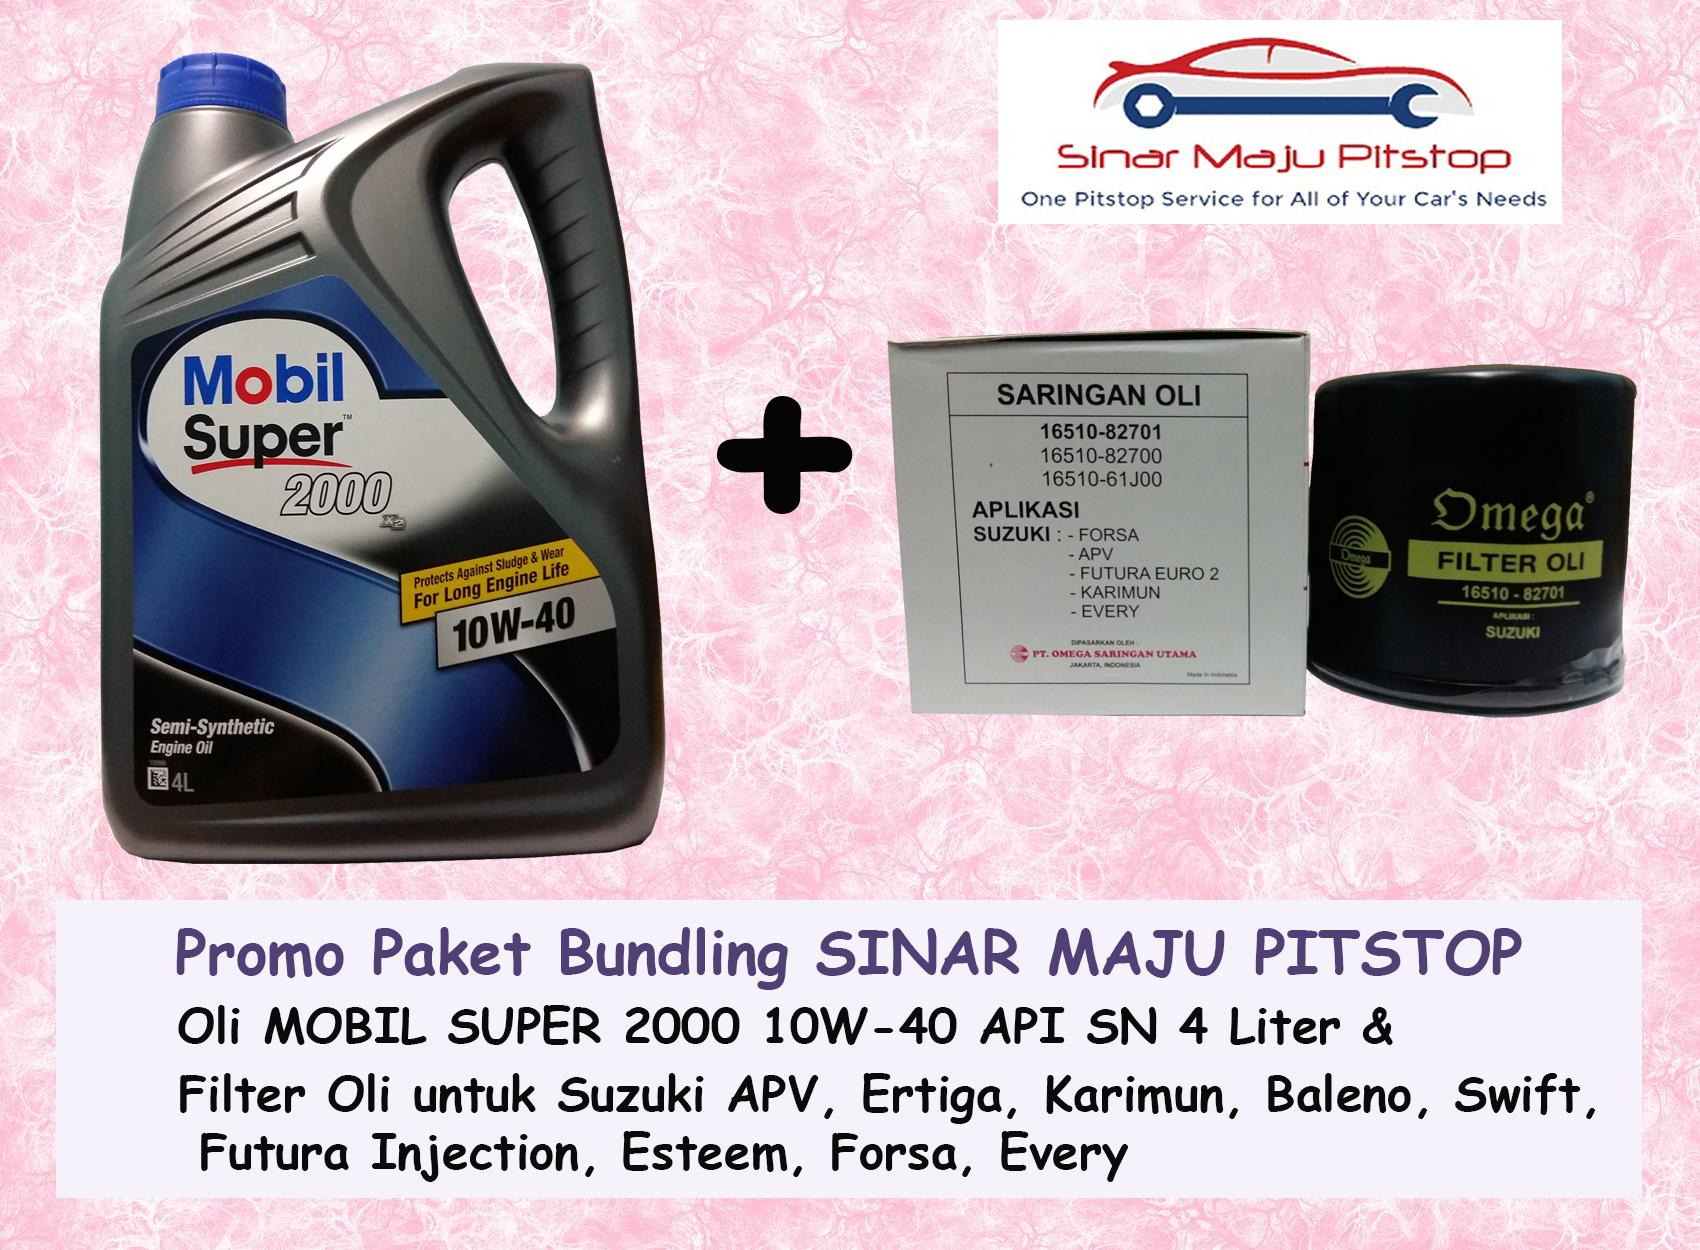 Promo Paket Bundling Oli MOBIL SUPER 2000 10W-40 API SN 4 LITER & Filter Oli SUZUKI ERTIGA & SUZUKI APV & SUZUKI BALENO ORIGINAL